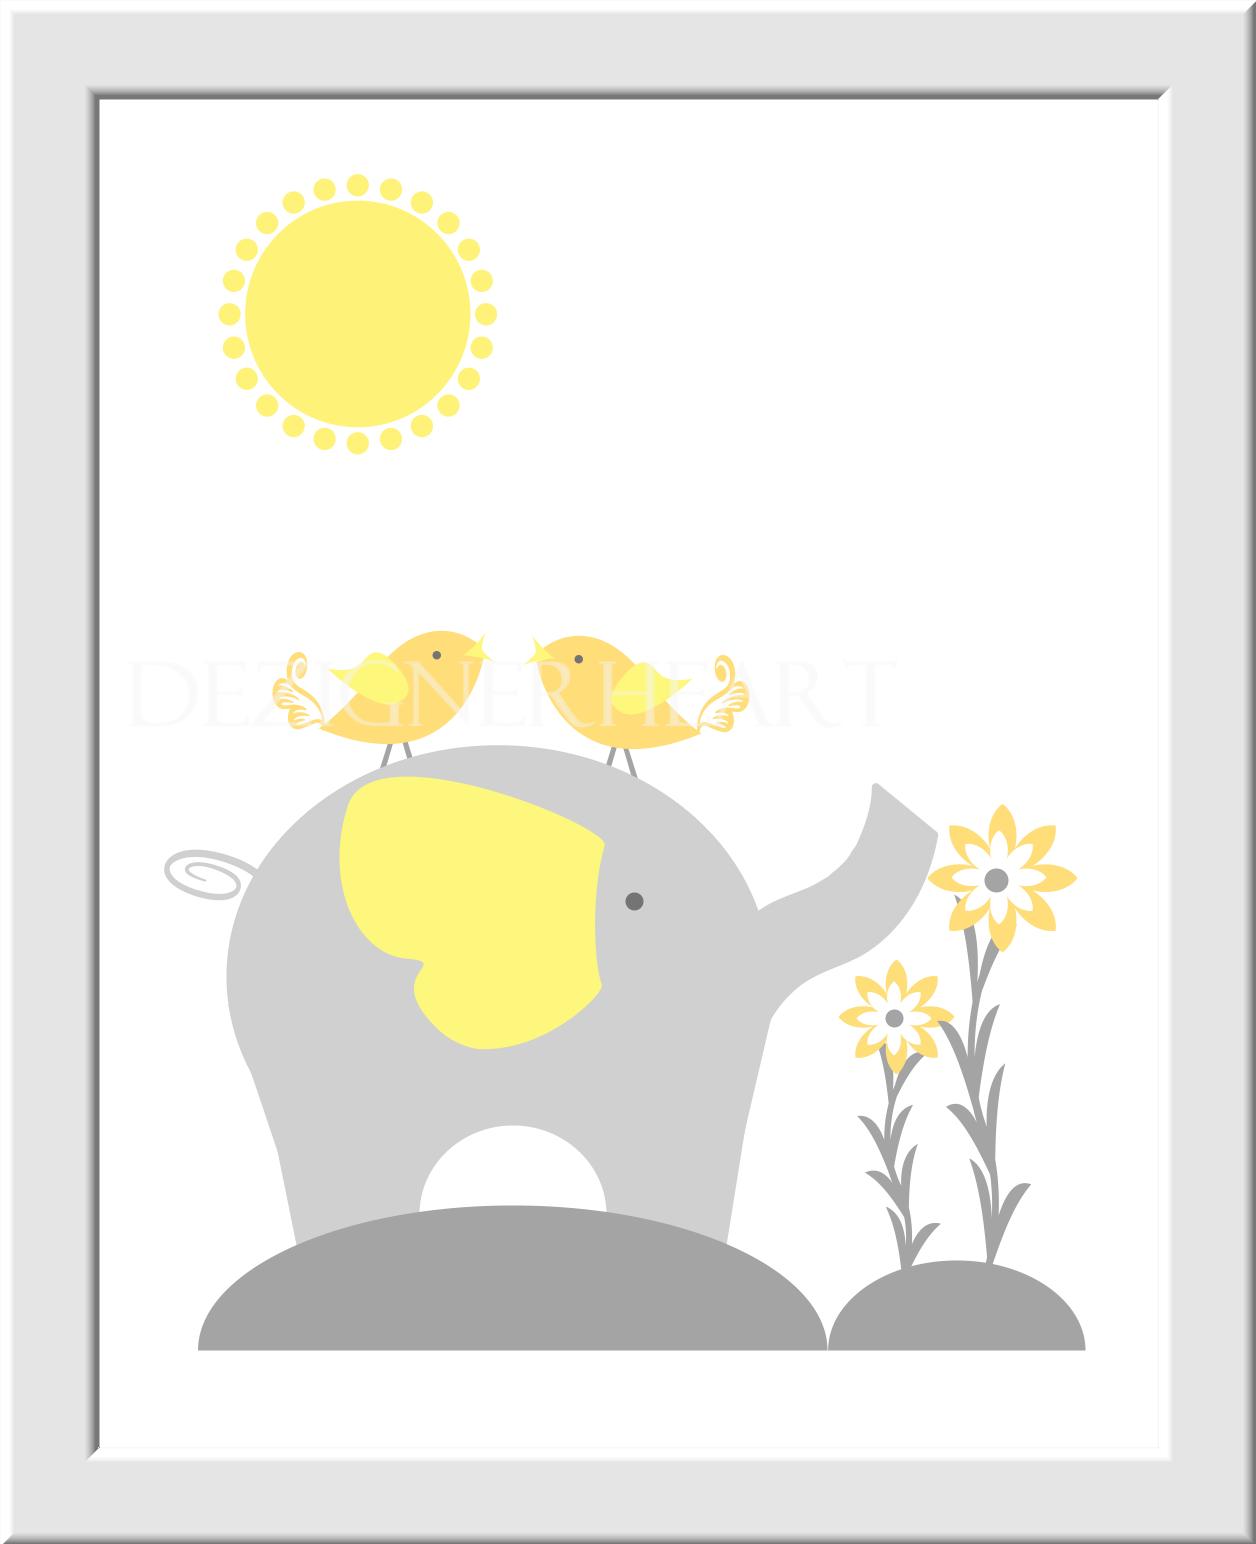 Baby nursery wall art gray yellow grey elephant giraffe tree jungle safari animals birds flowers prints for baby boy nursery prints for baby girl wall baby nursery wall art gray yellow grey elephant giraffe tree jungle safari animals birds flowers prints